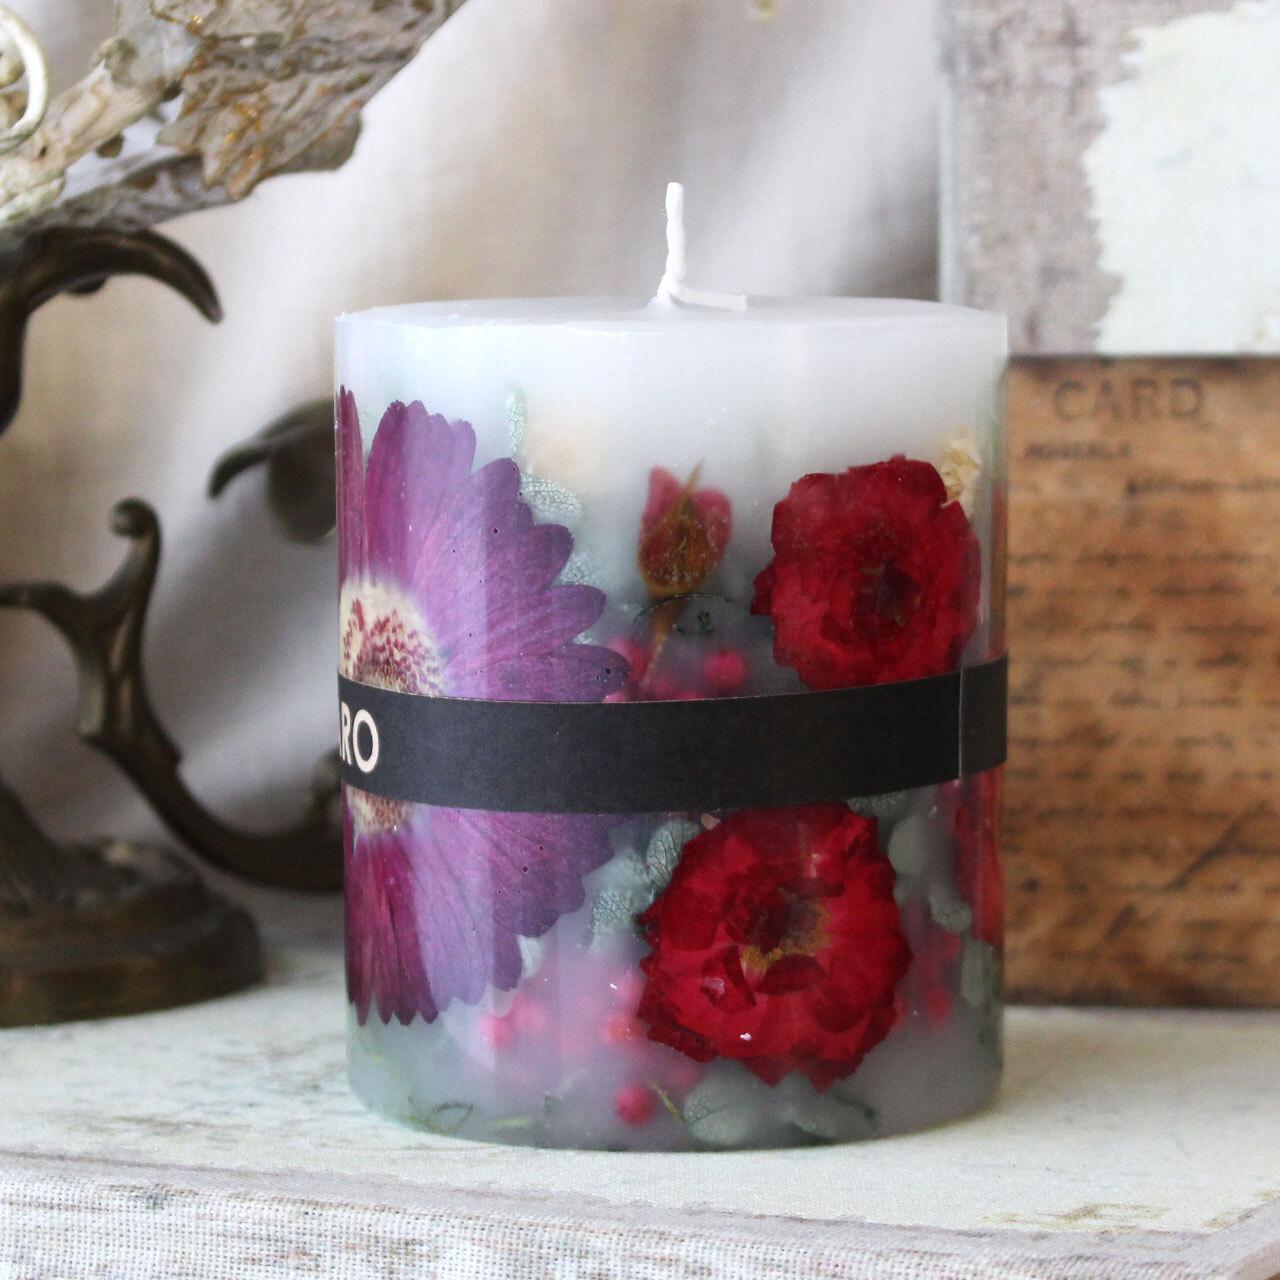 BC625 ガーベラのイエローボタニカルキャンドル ロマンティックガーデンの香り